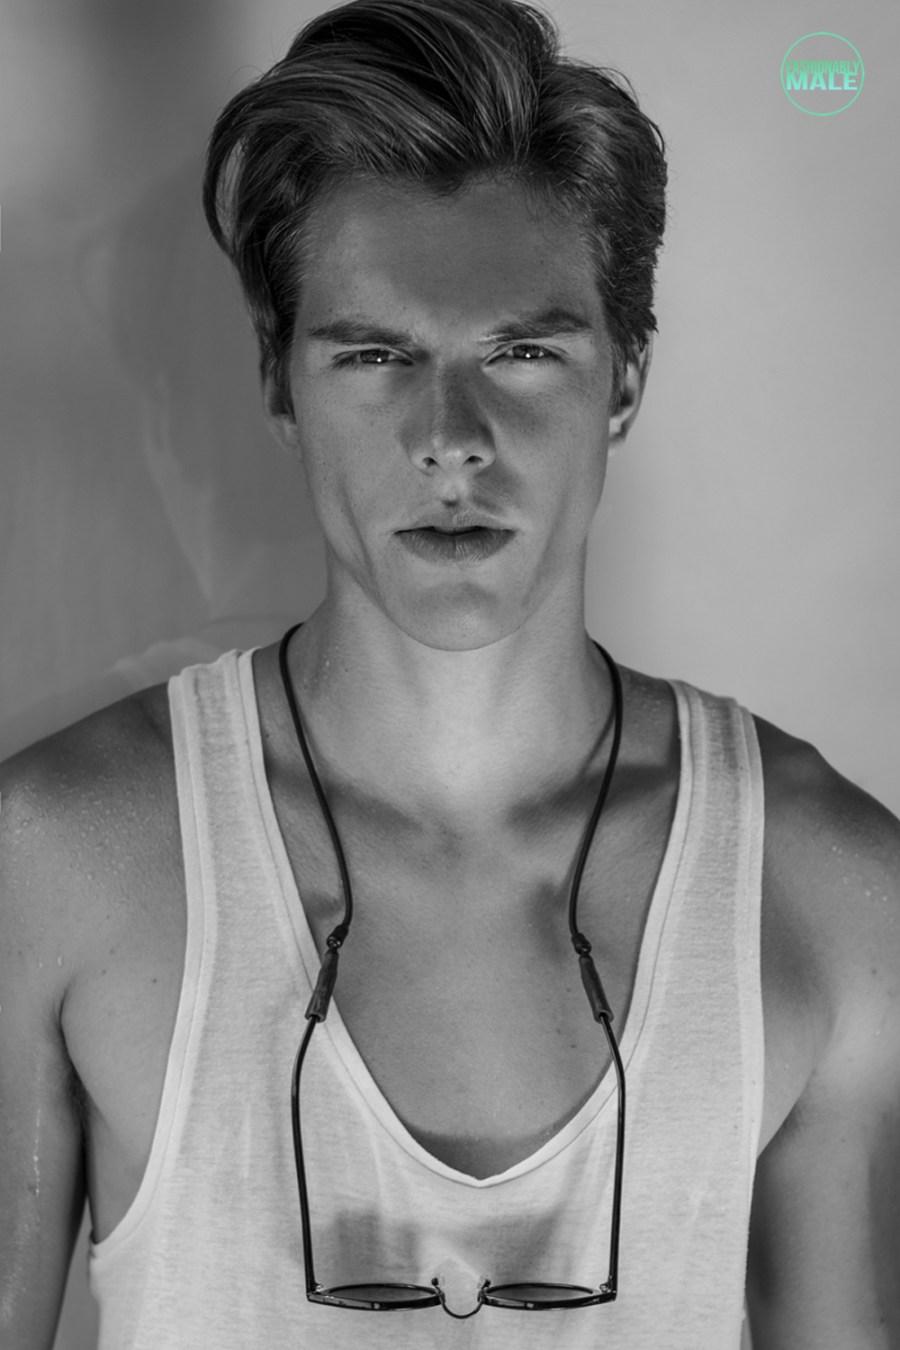 Connor Straathof07